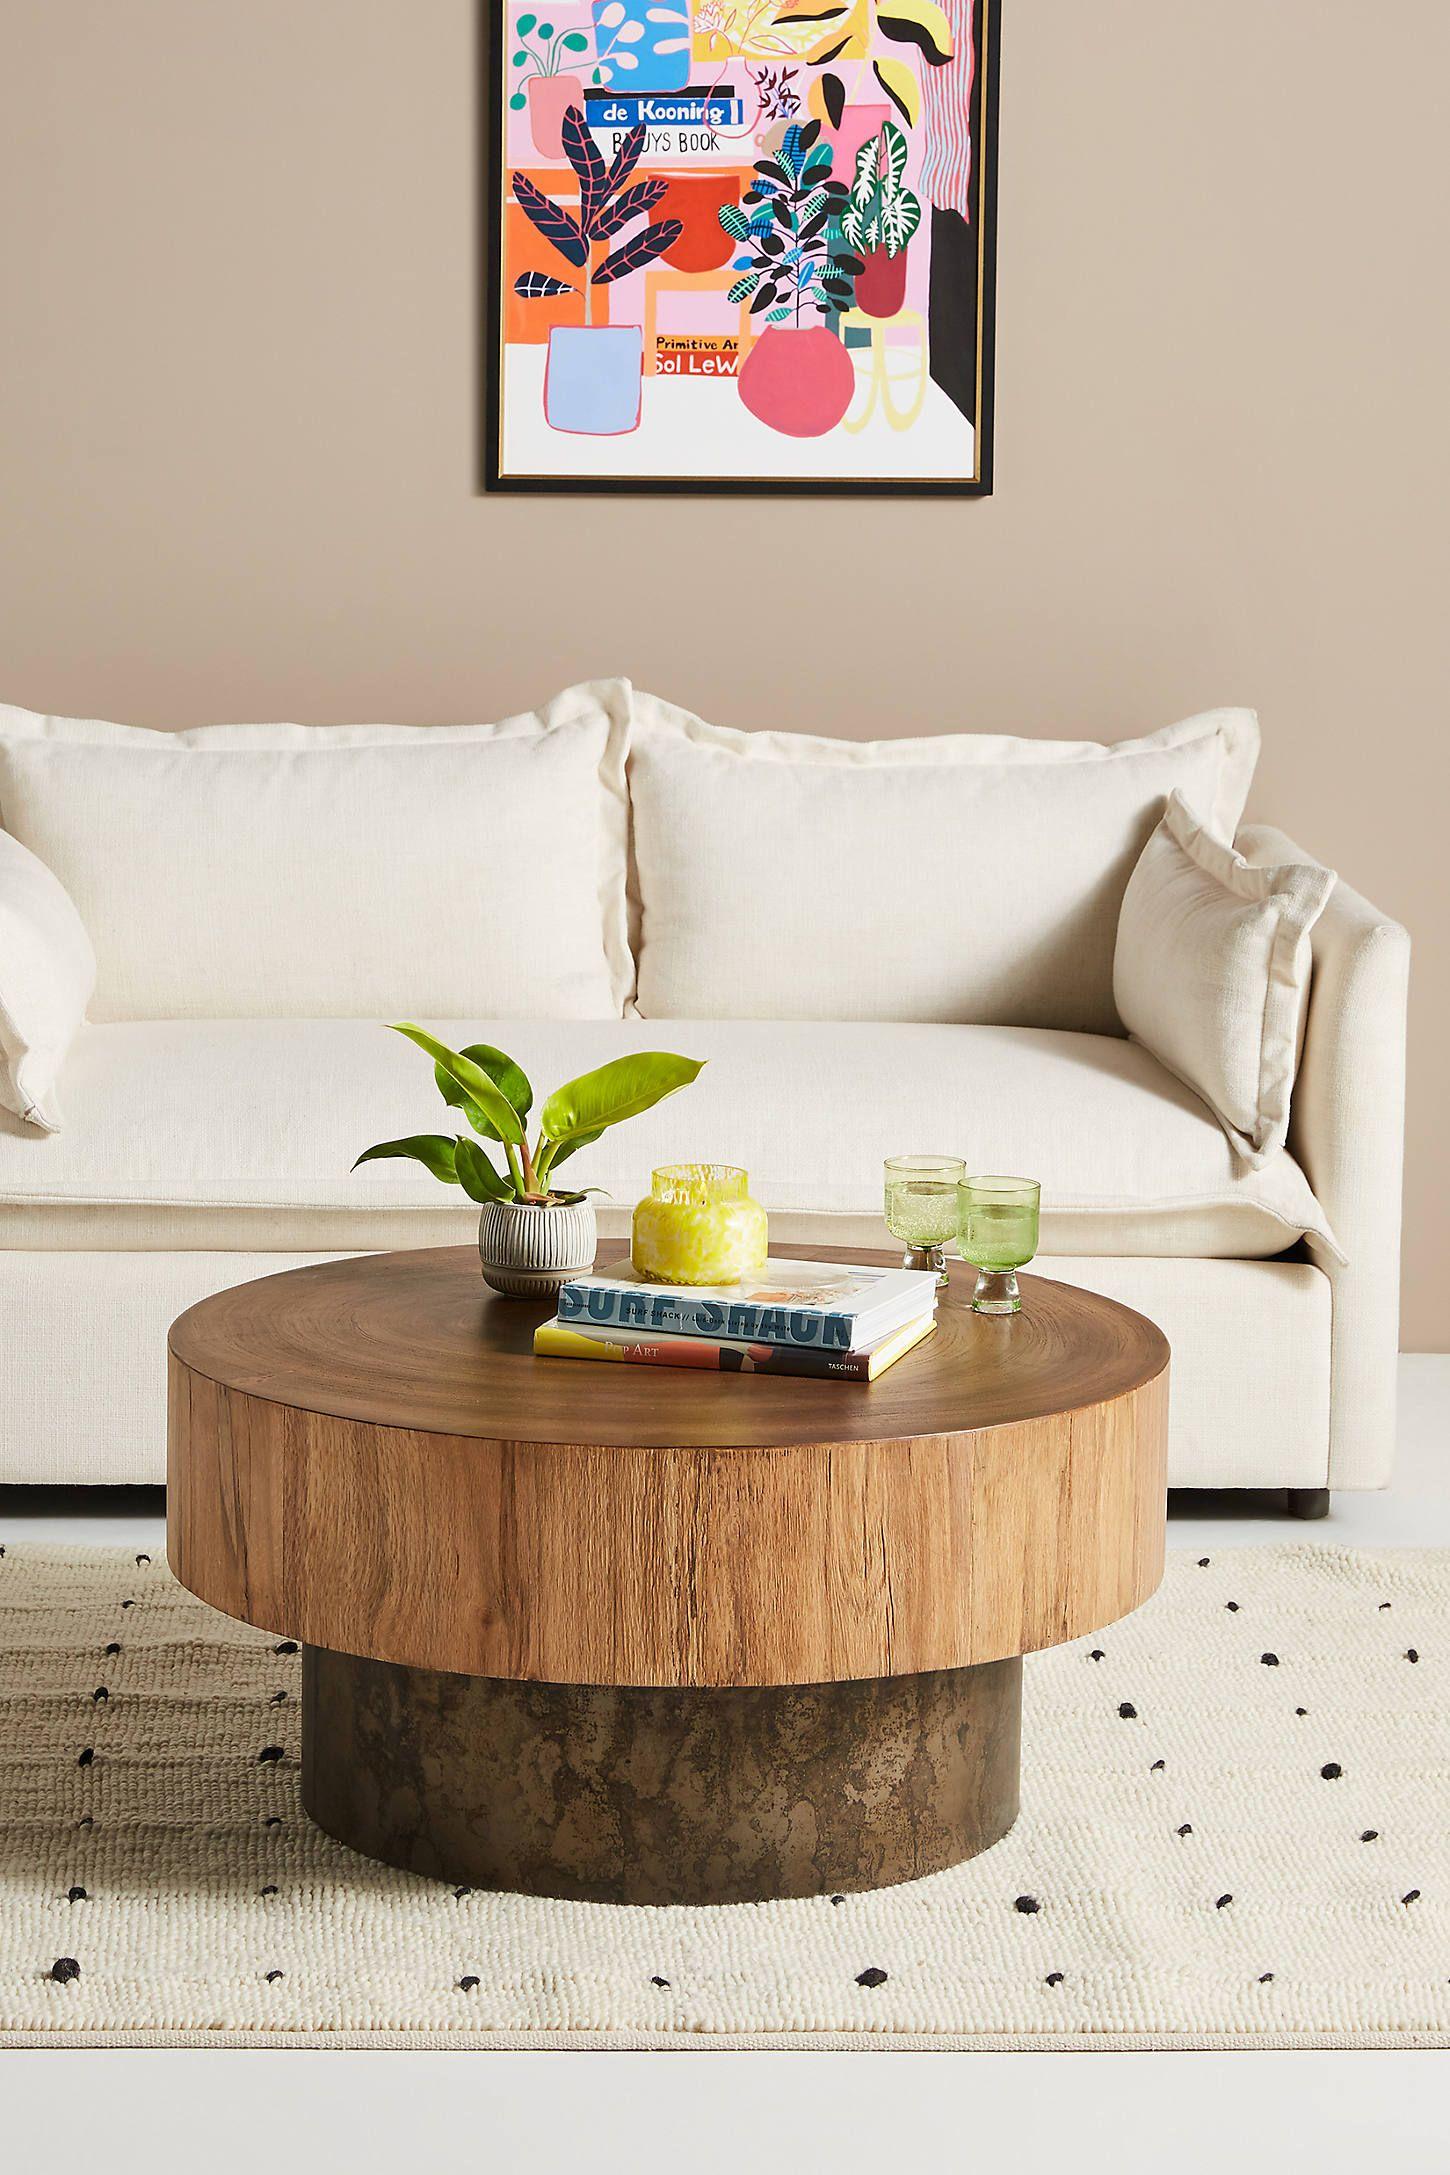 Tambor High Coffee Table In 2020 Unique Coffee Table Coffee Table Coffee Table Design #unique #living #room #tables